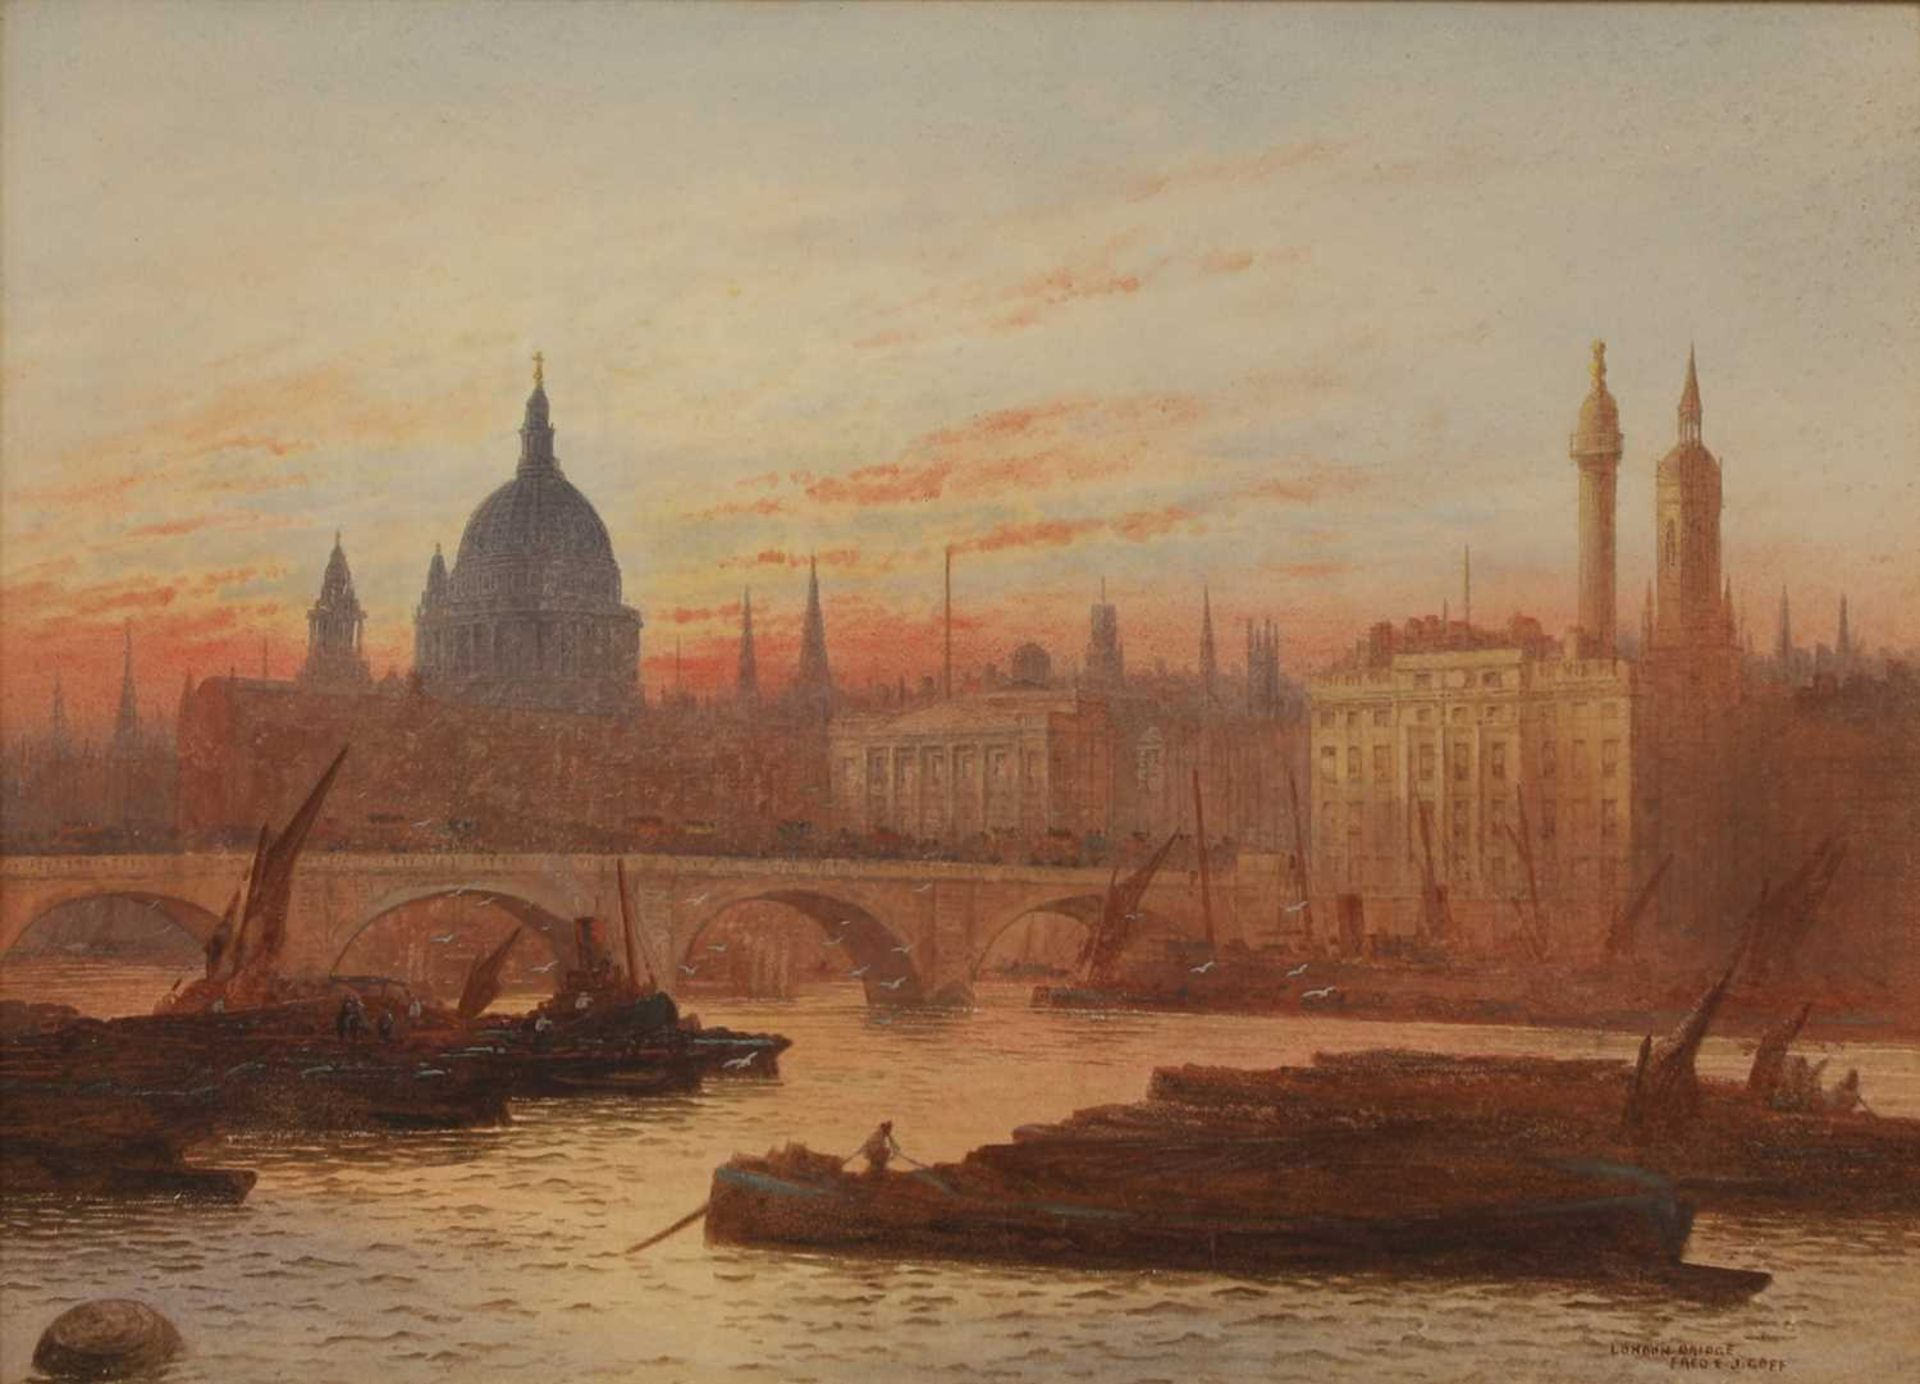 FREDERICK EDWARD JOHN GOFF (1855-1931)